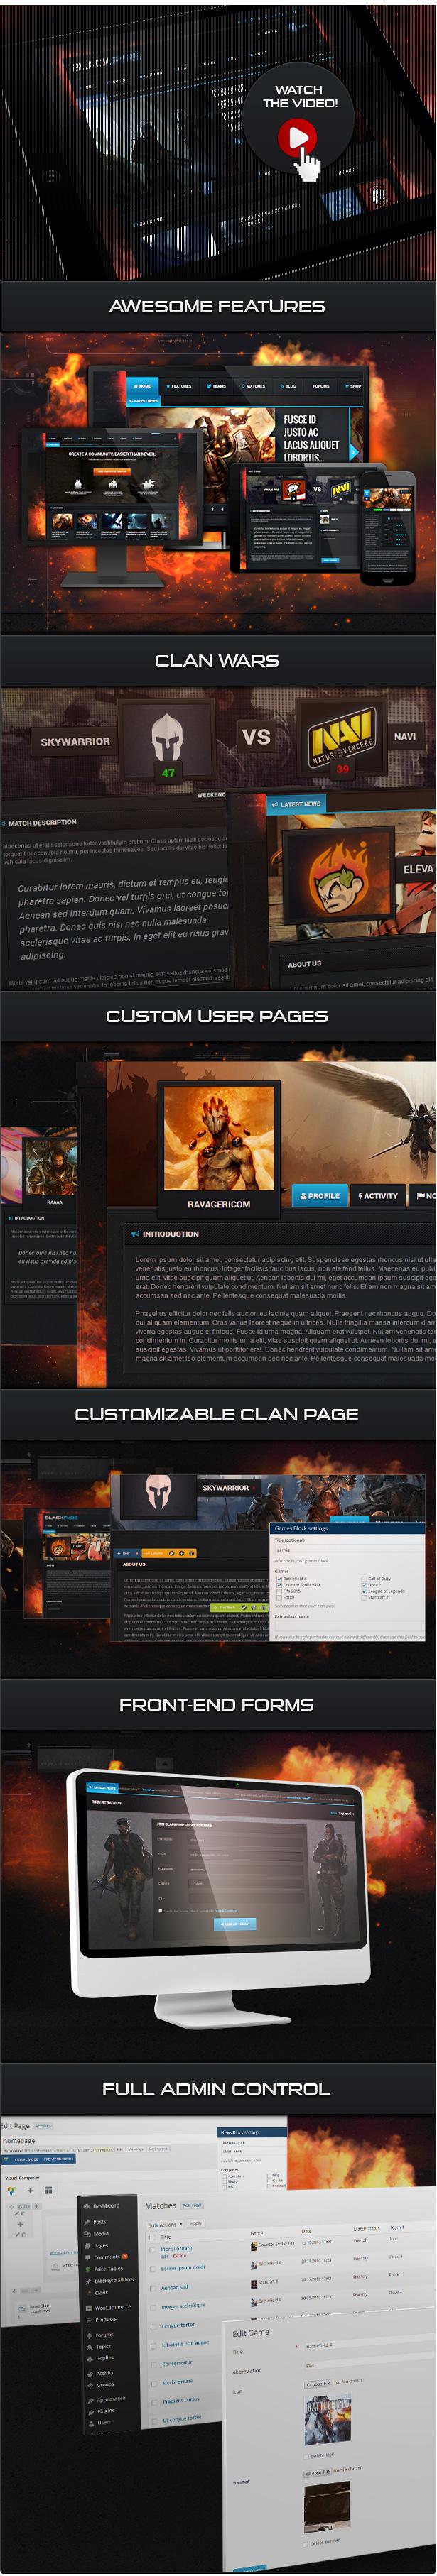 Blackfyre - أنشئ مجتمع الألعاب الخاص بك - 2